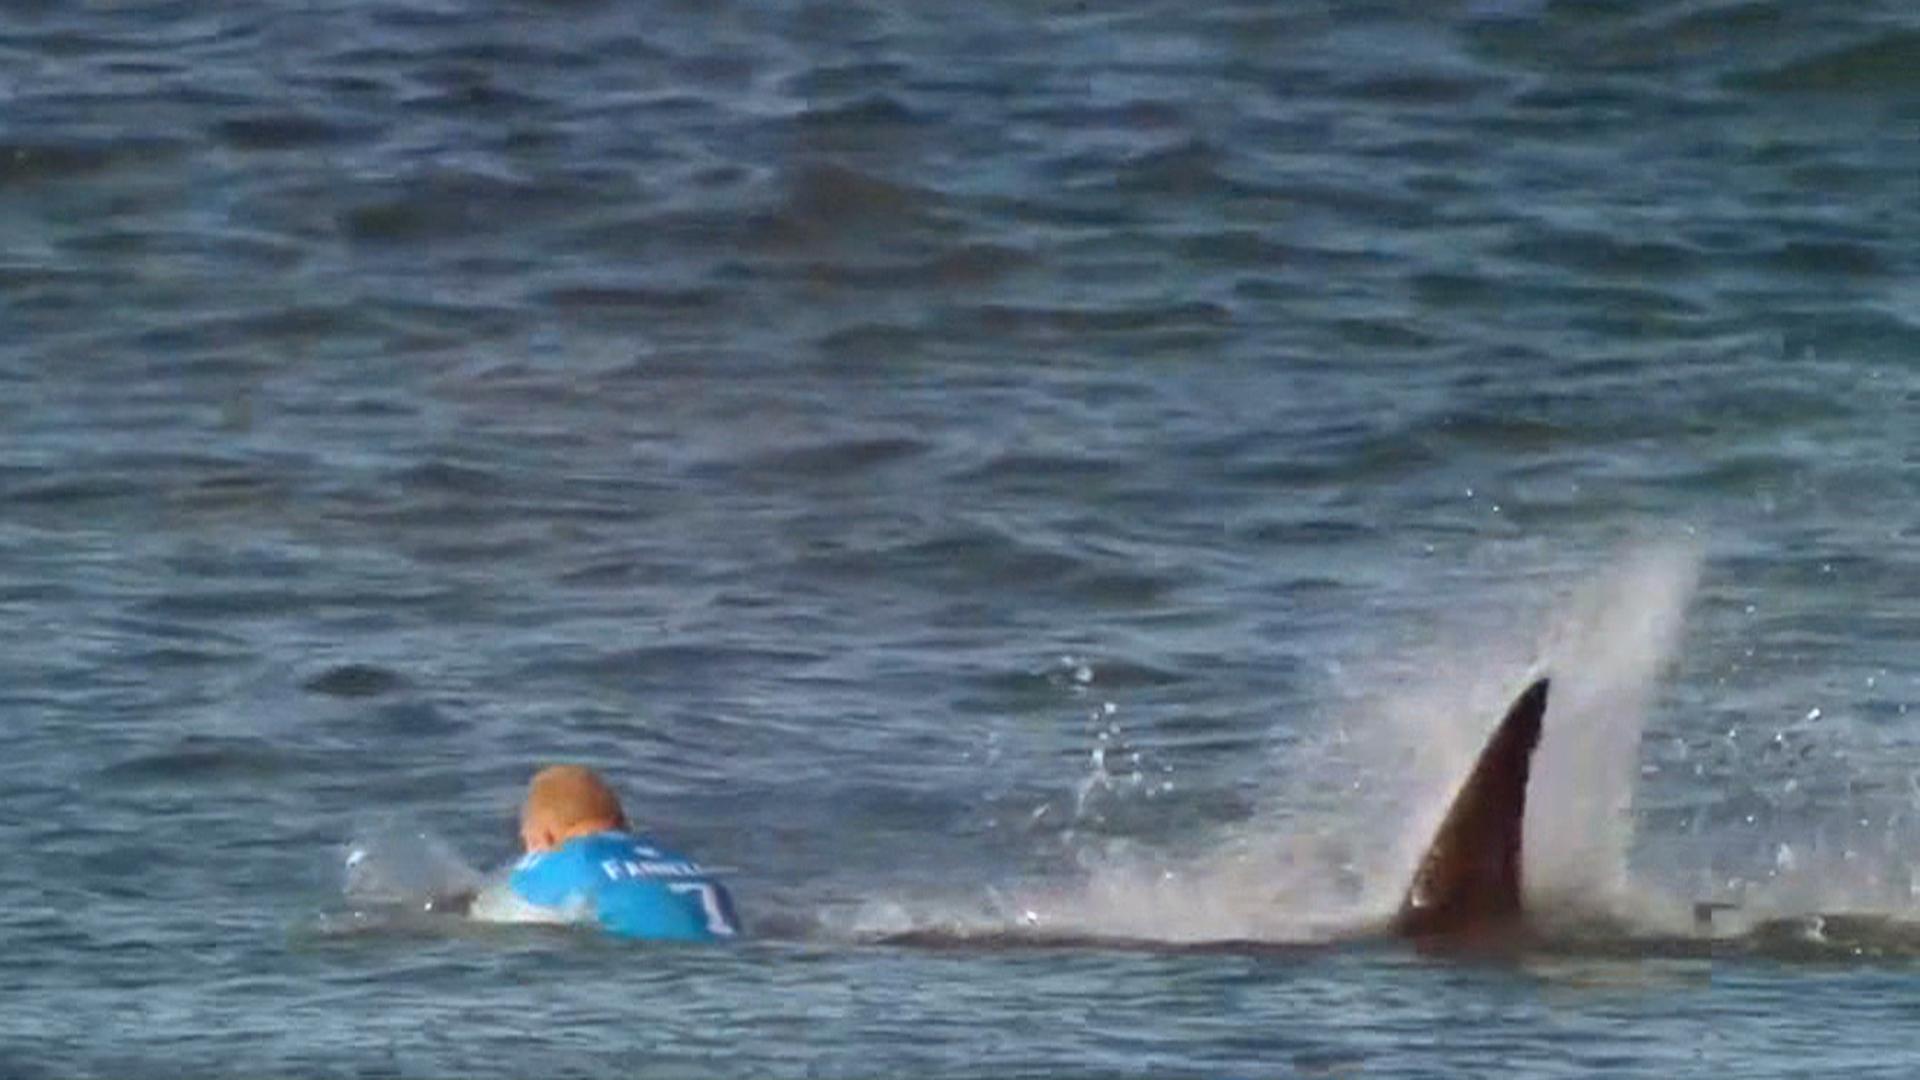 Surfer Girl Bali Wallpaper Watch Surfer Mick Fanning Fight Off Shark Attack Nbc News